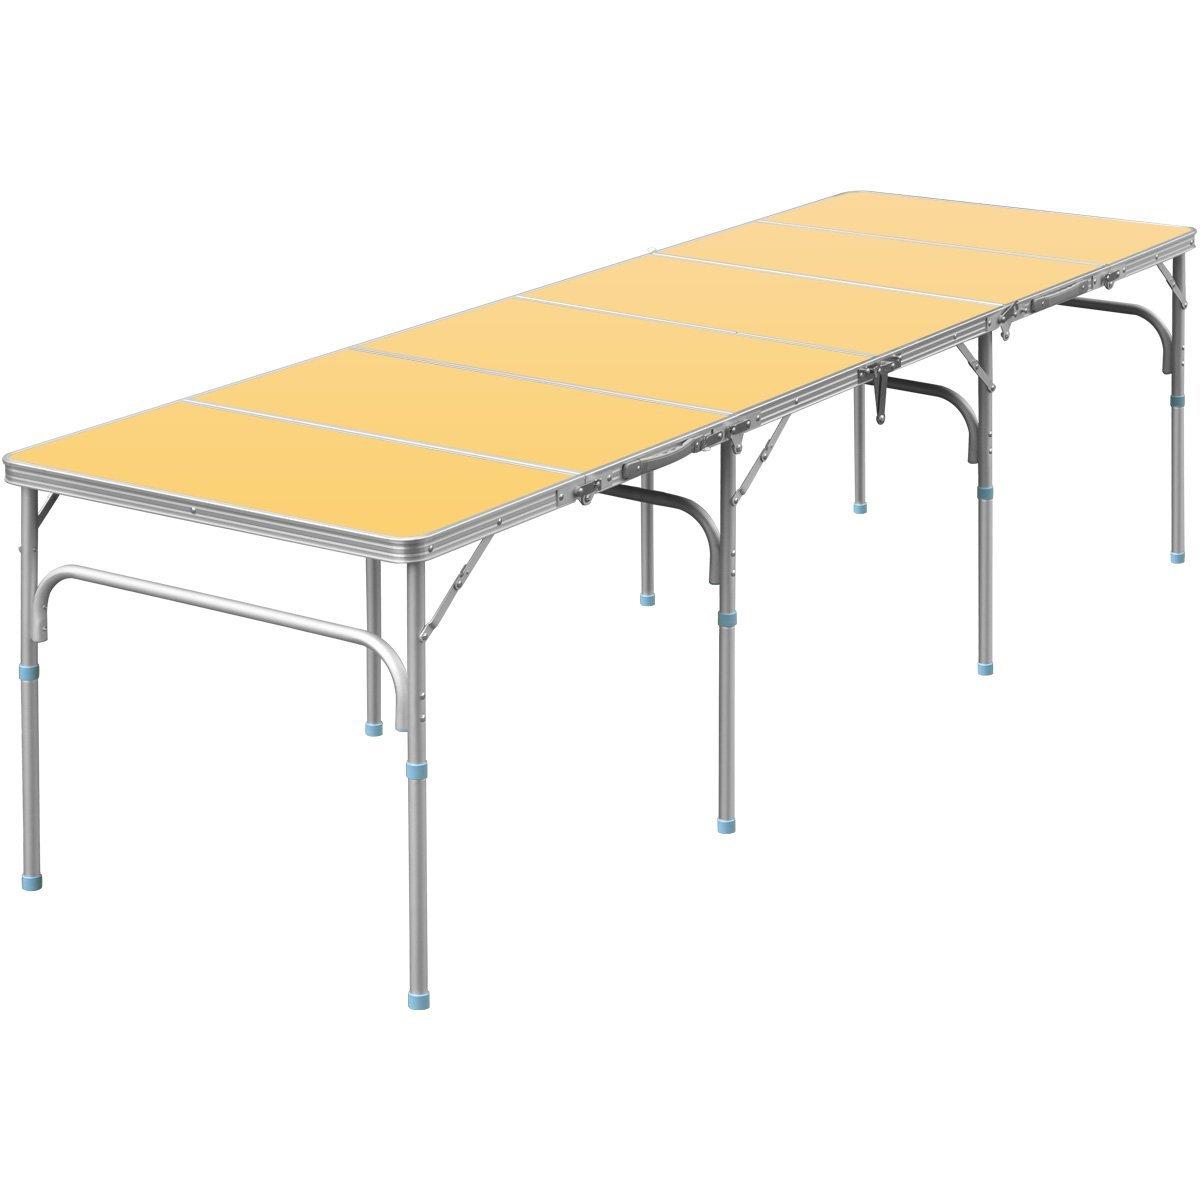 FIELDOOR 六つ折り収納式アルミレジャーテーブル